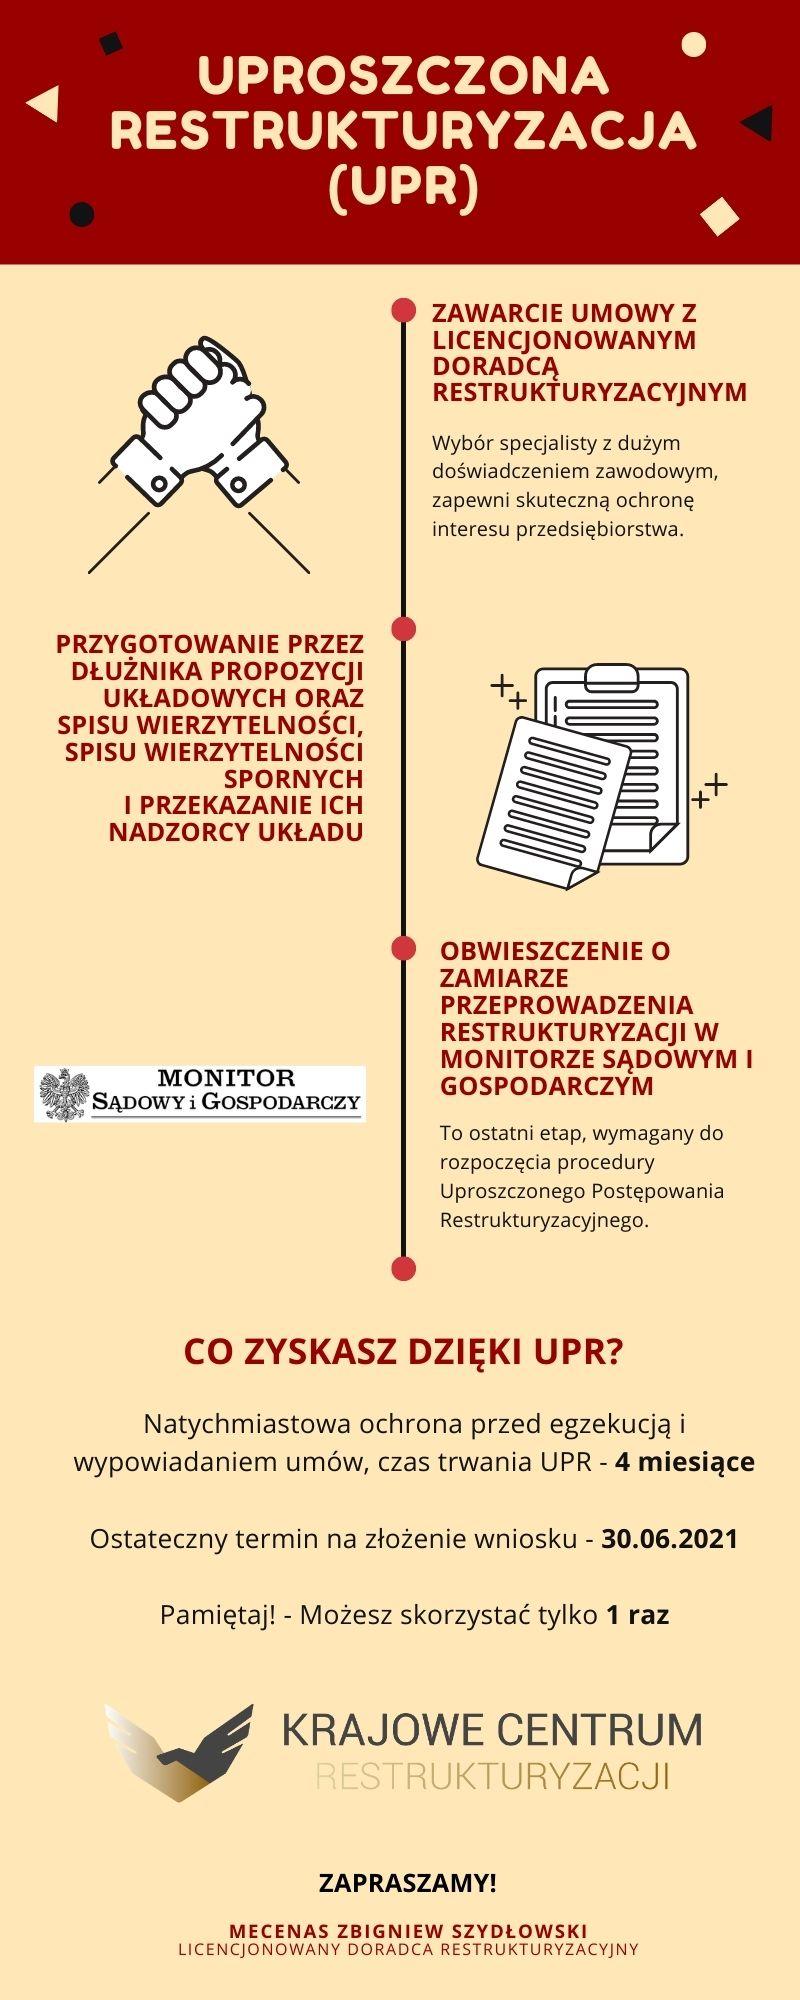 http://kcr.org.pl/wp-content/uploads/2020/11/Red-Illustrated-Timeline-Infographic.jpg